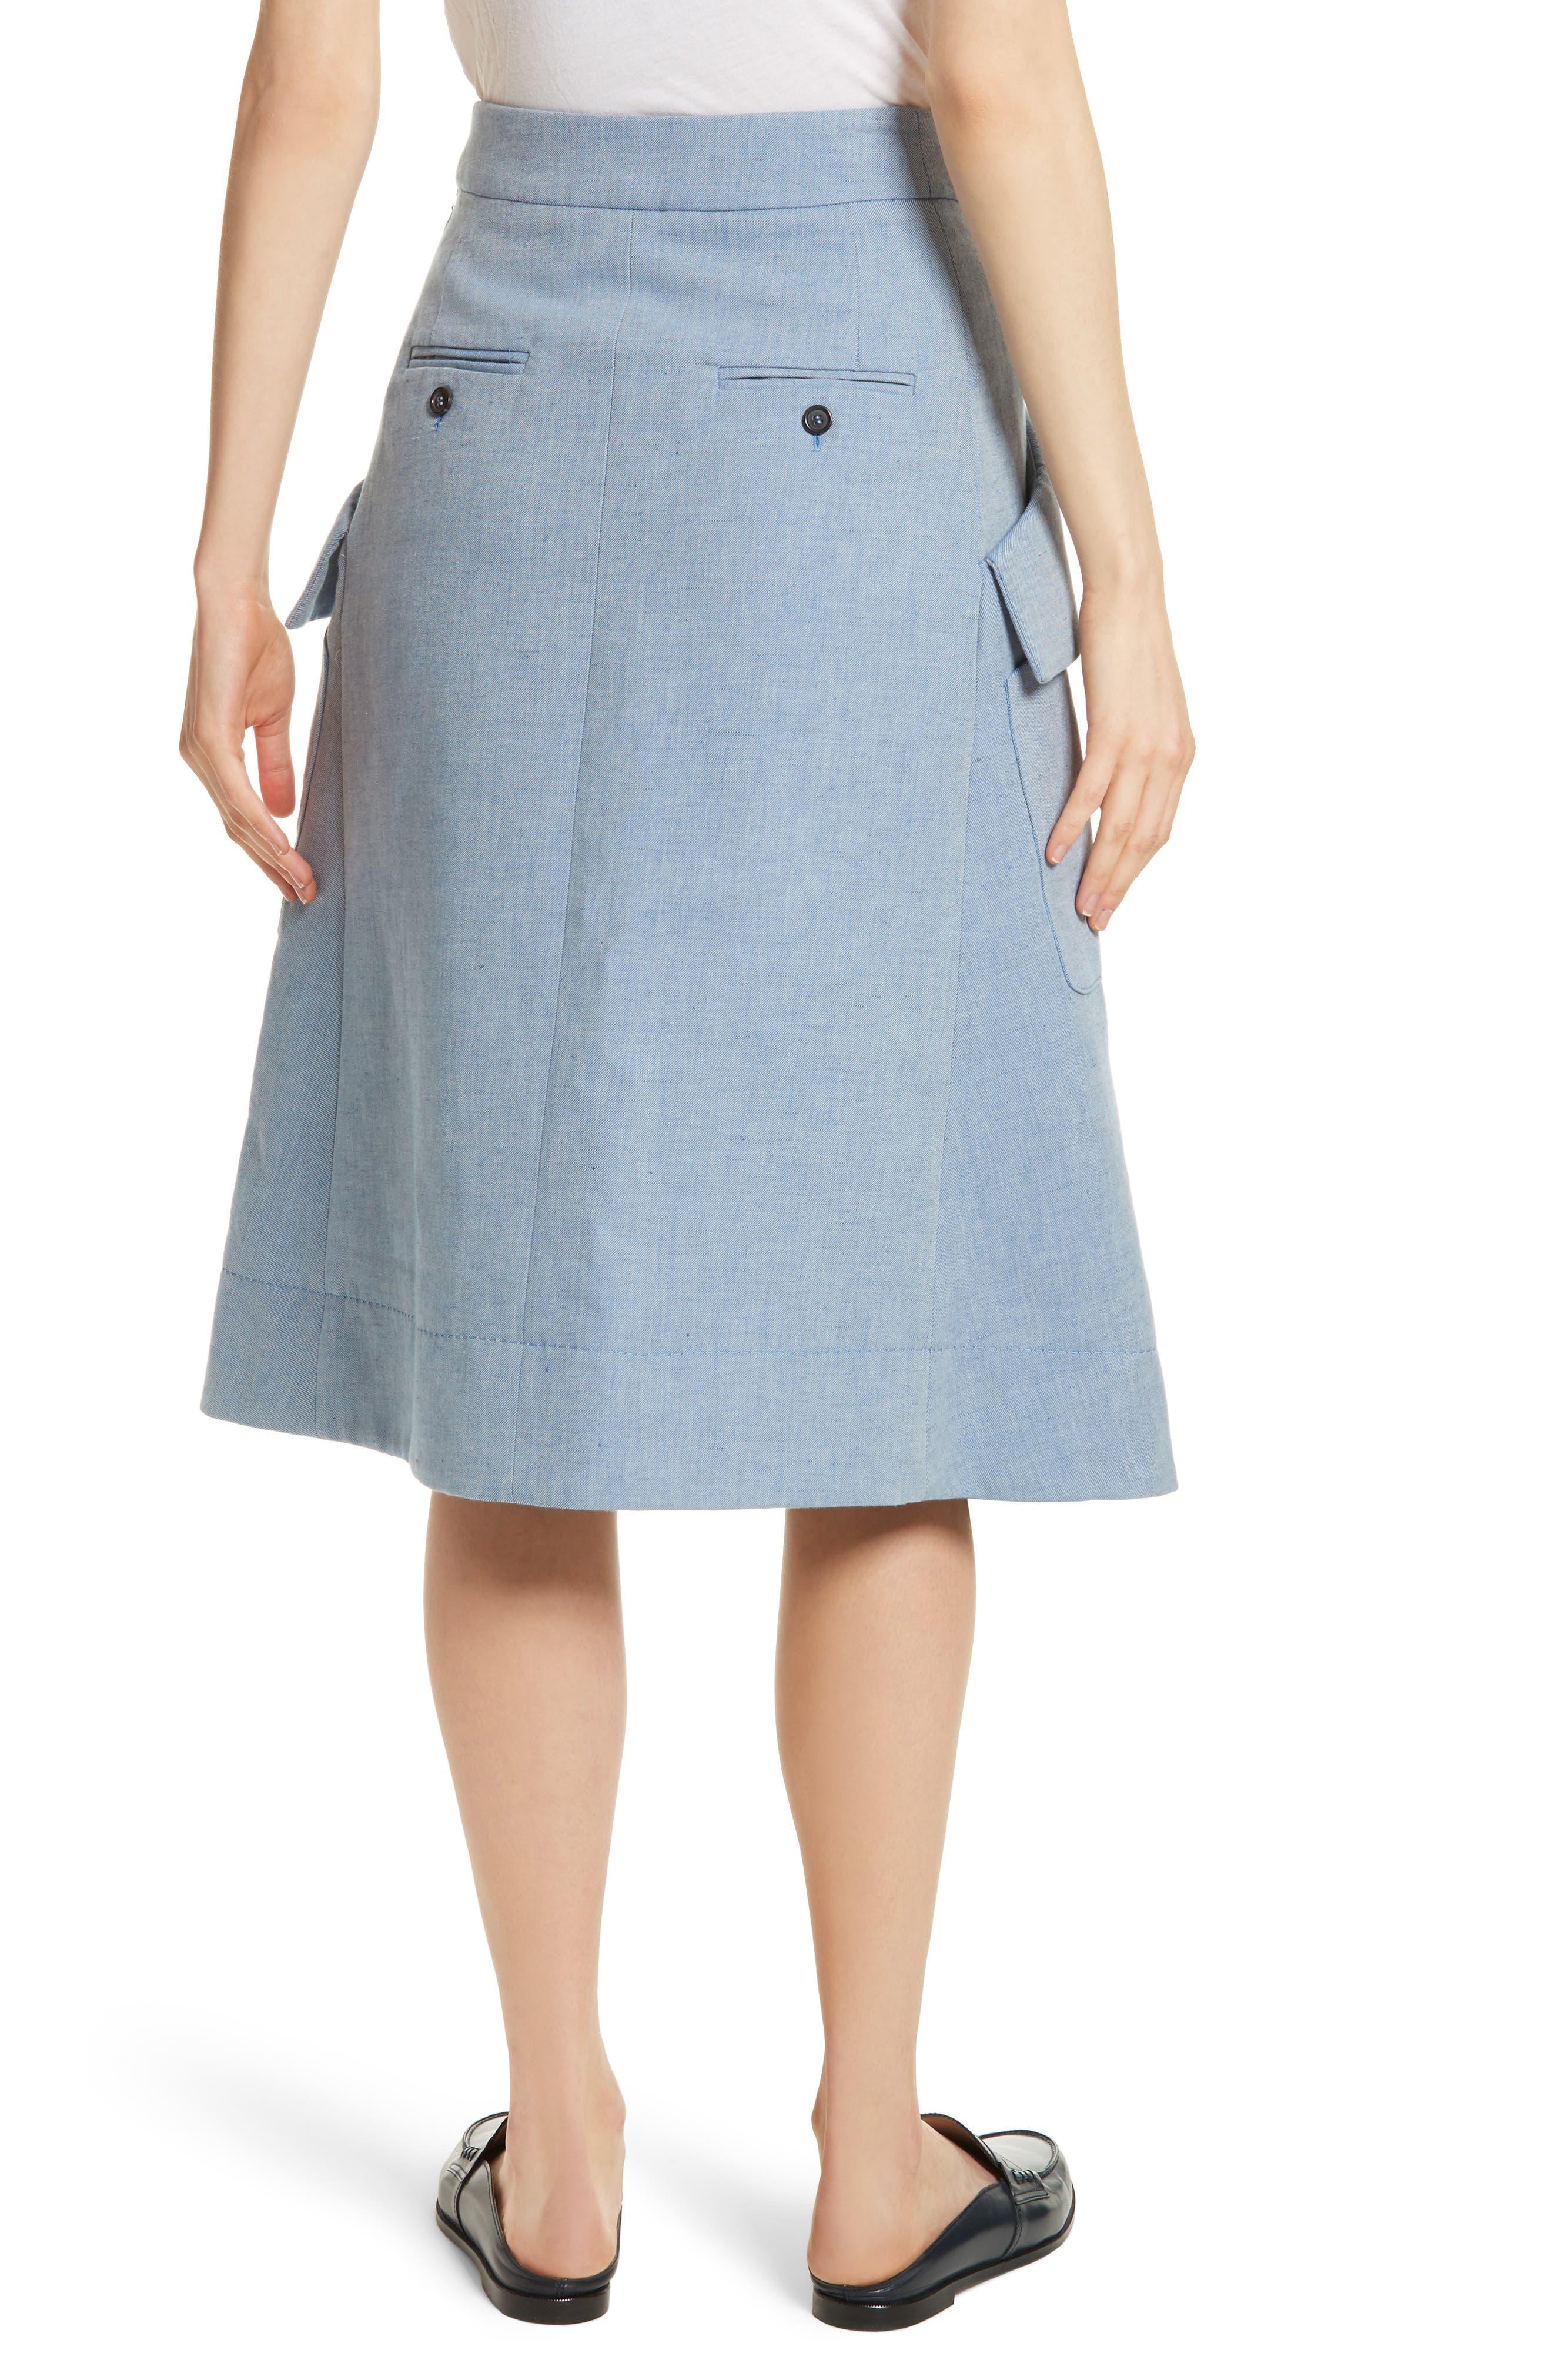 Jupe Genou Skirt,                             Alternate thumbnail 2, color,                             Bleu Acier